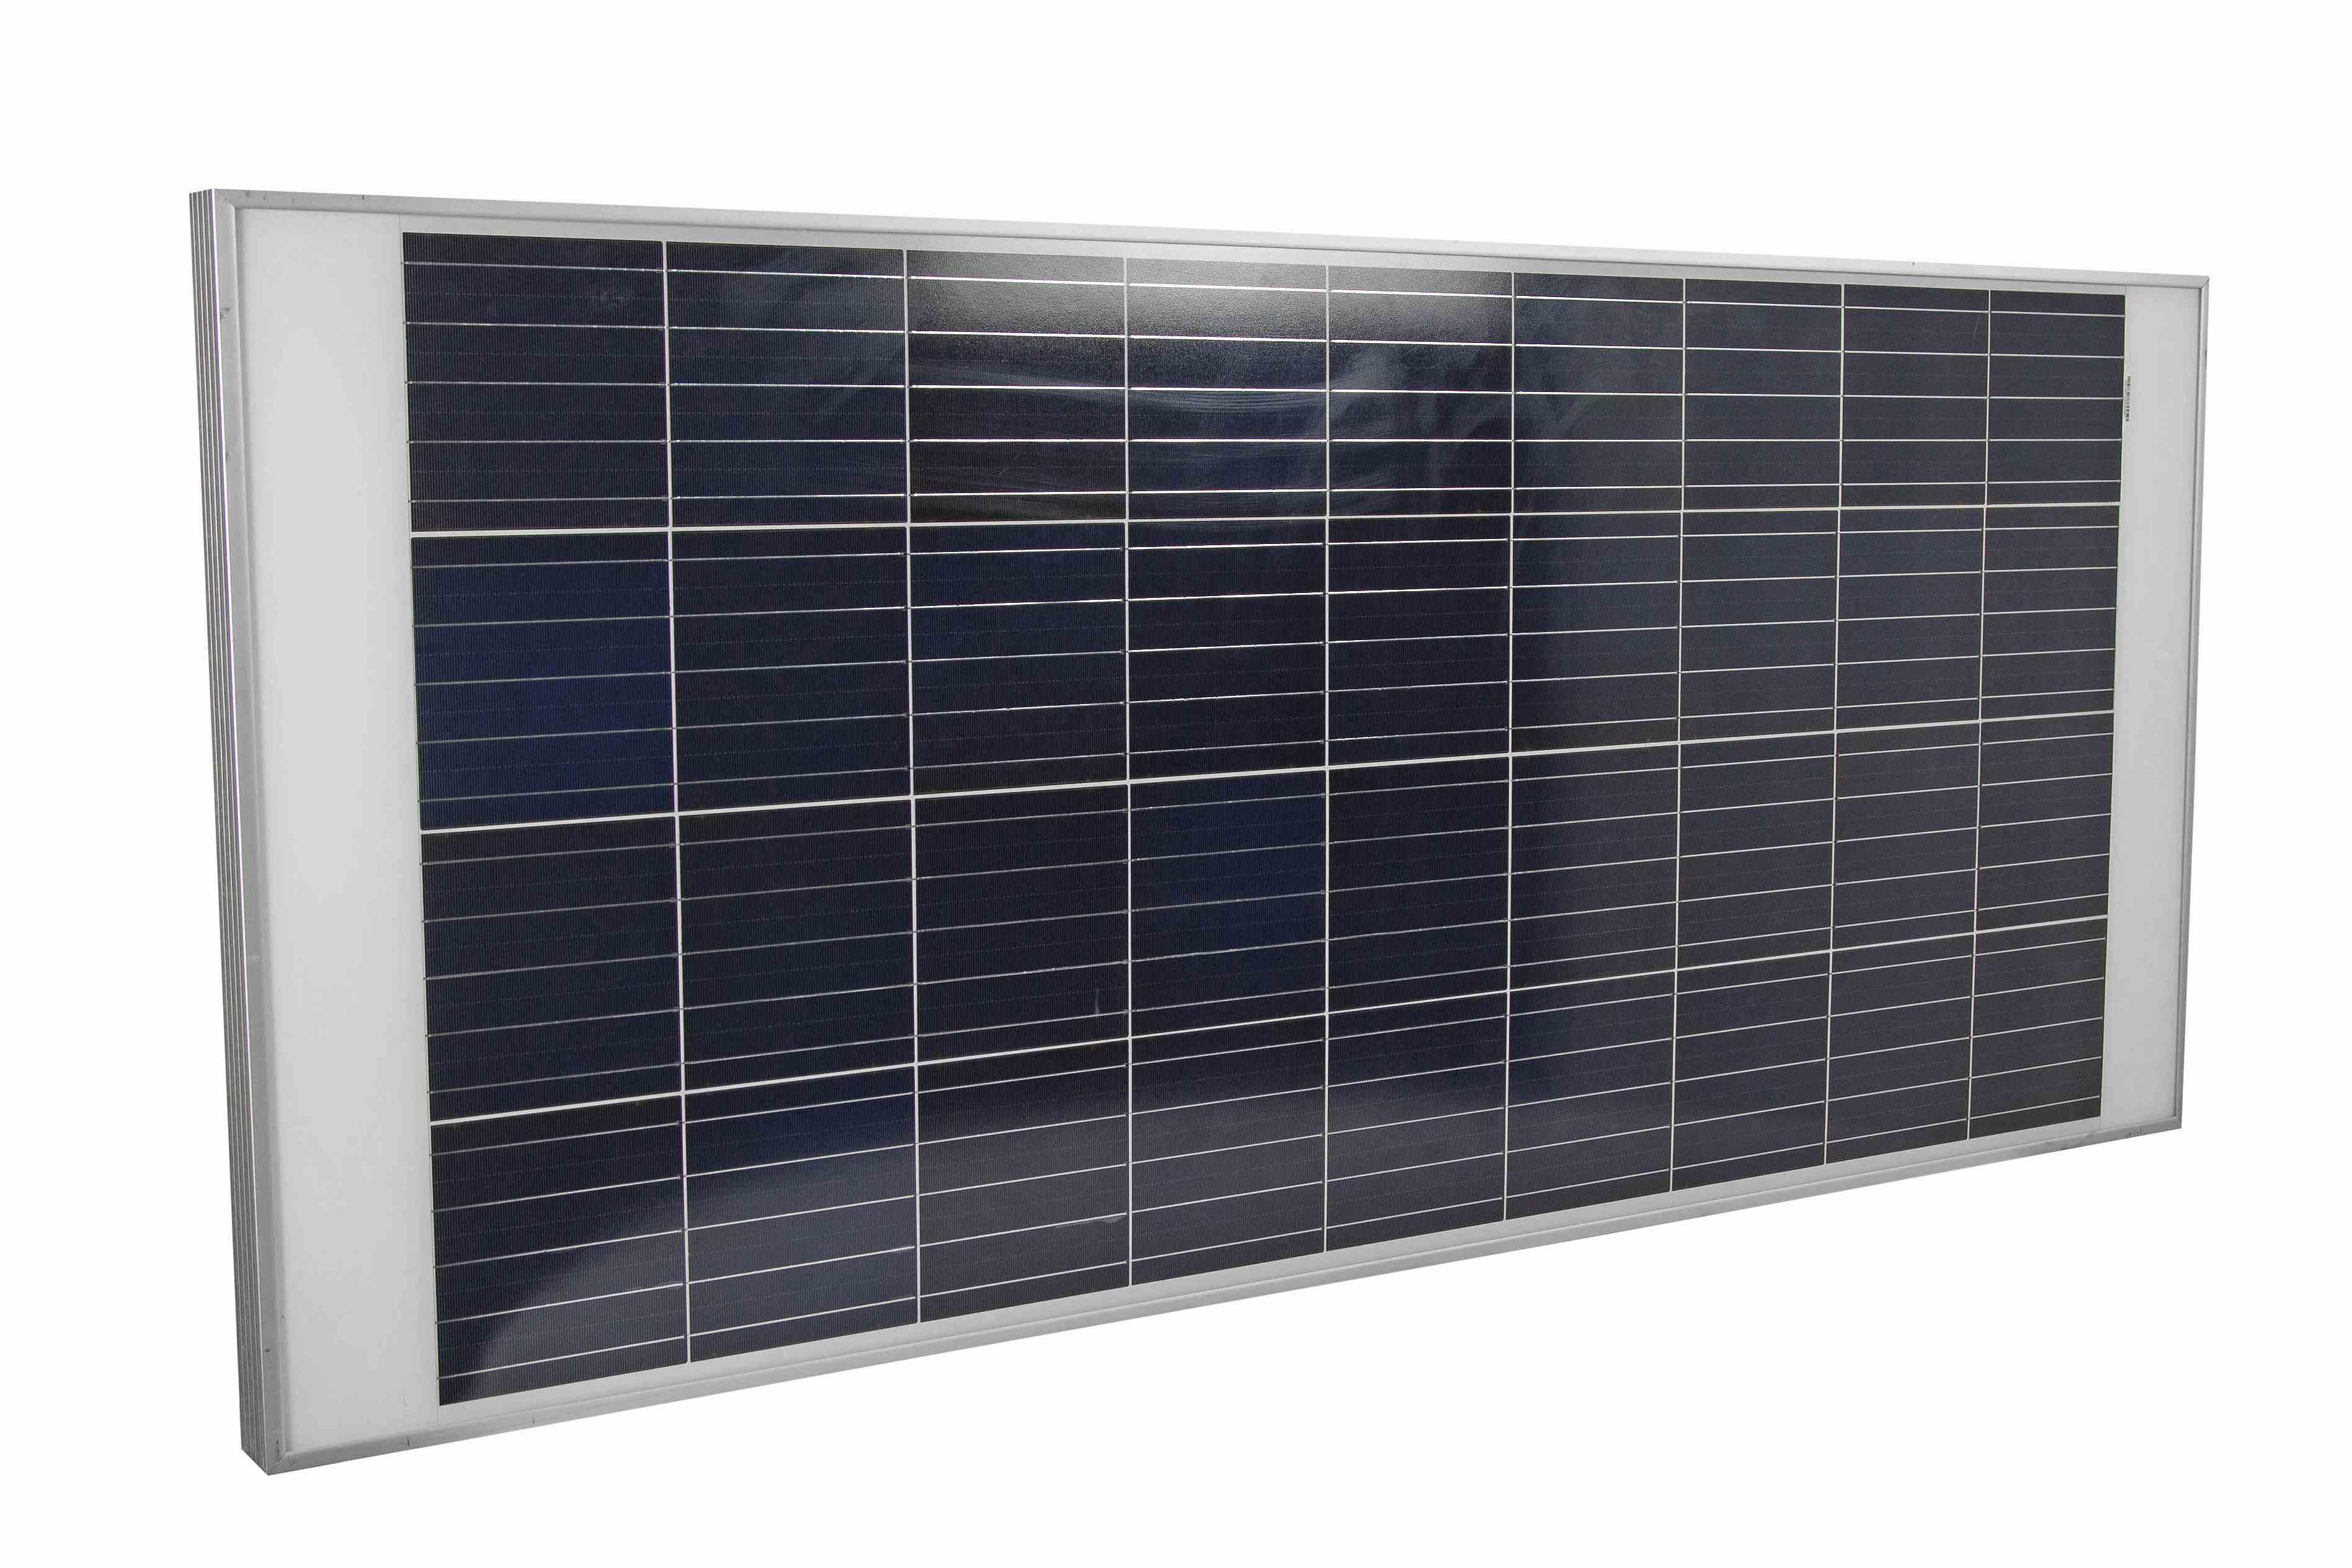 300 Watt Solar Power Panel - 60 Cell Utility Module - Anodized Aluminum  Frame